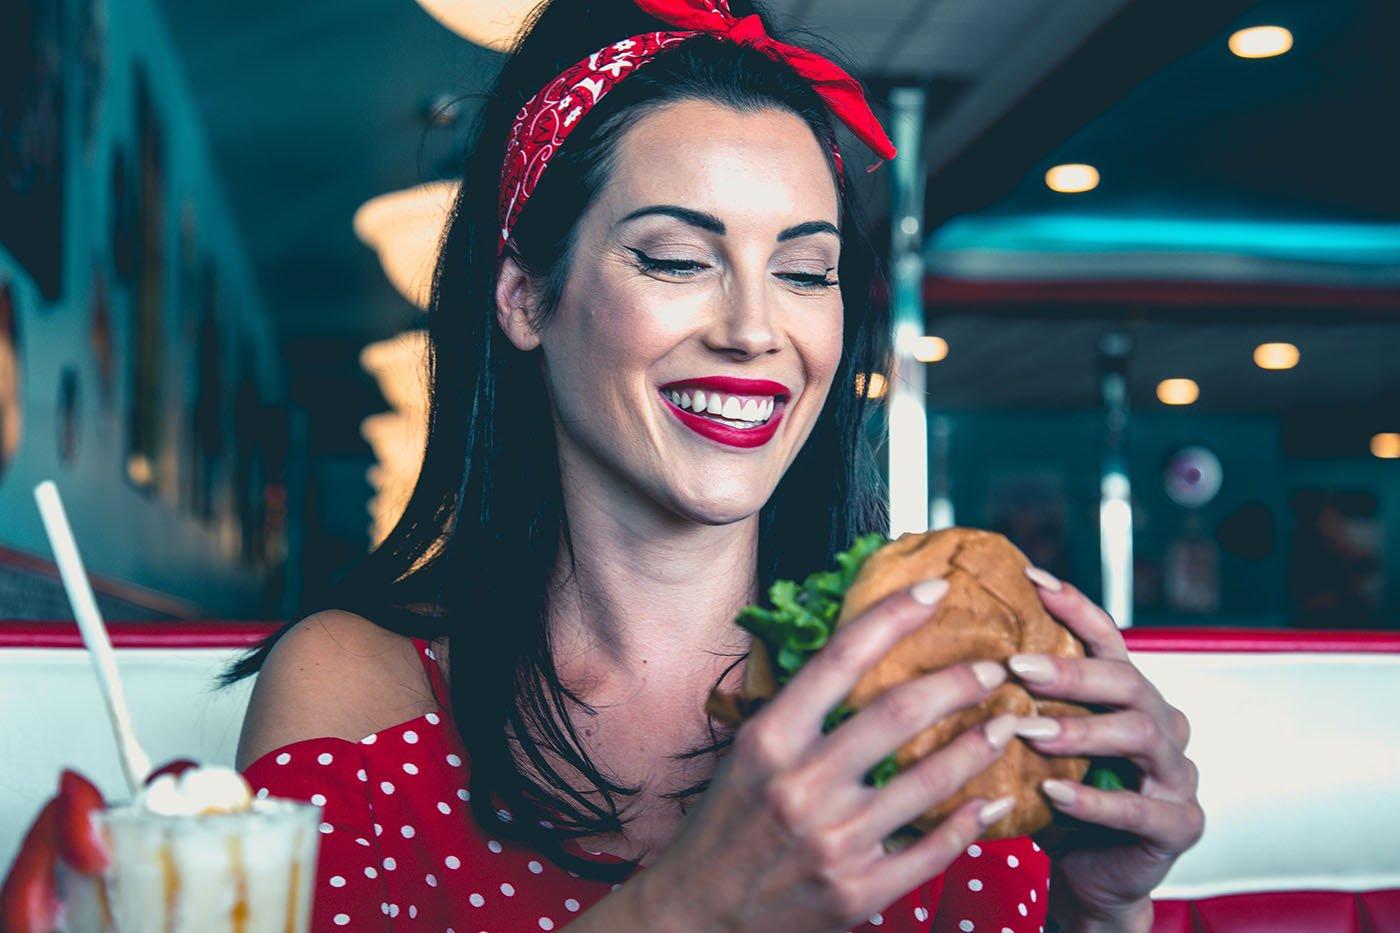 American Diner Burger Restaurant American Diner Restaurant - Our History 3